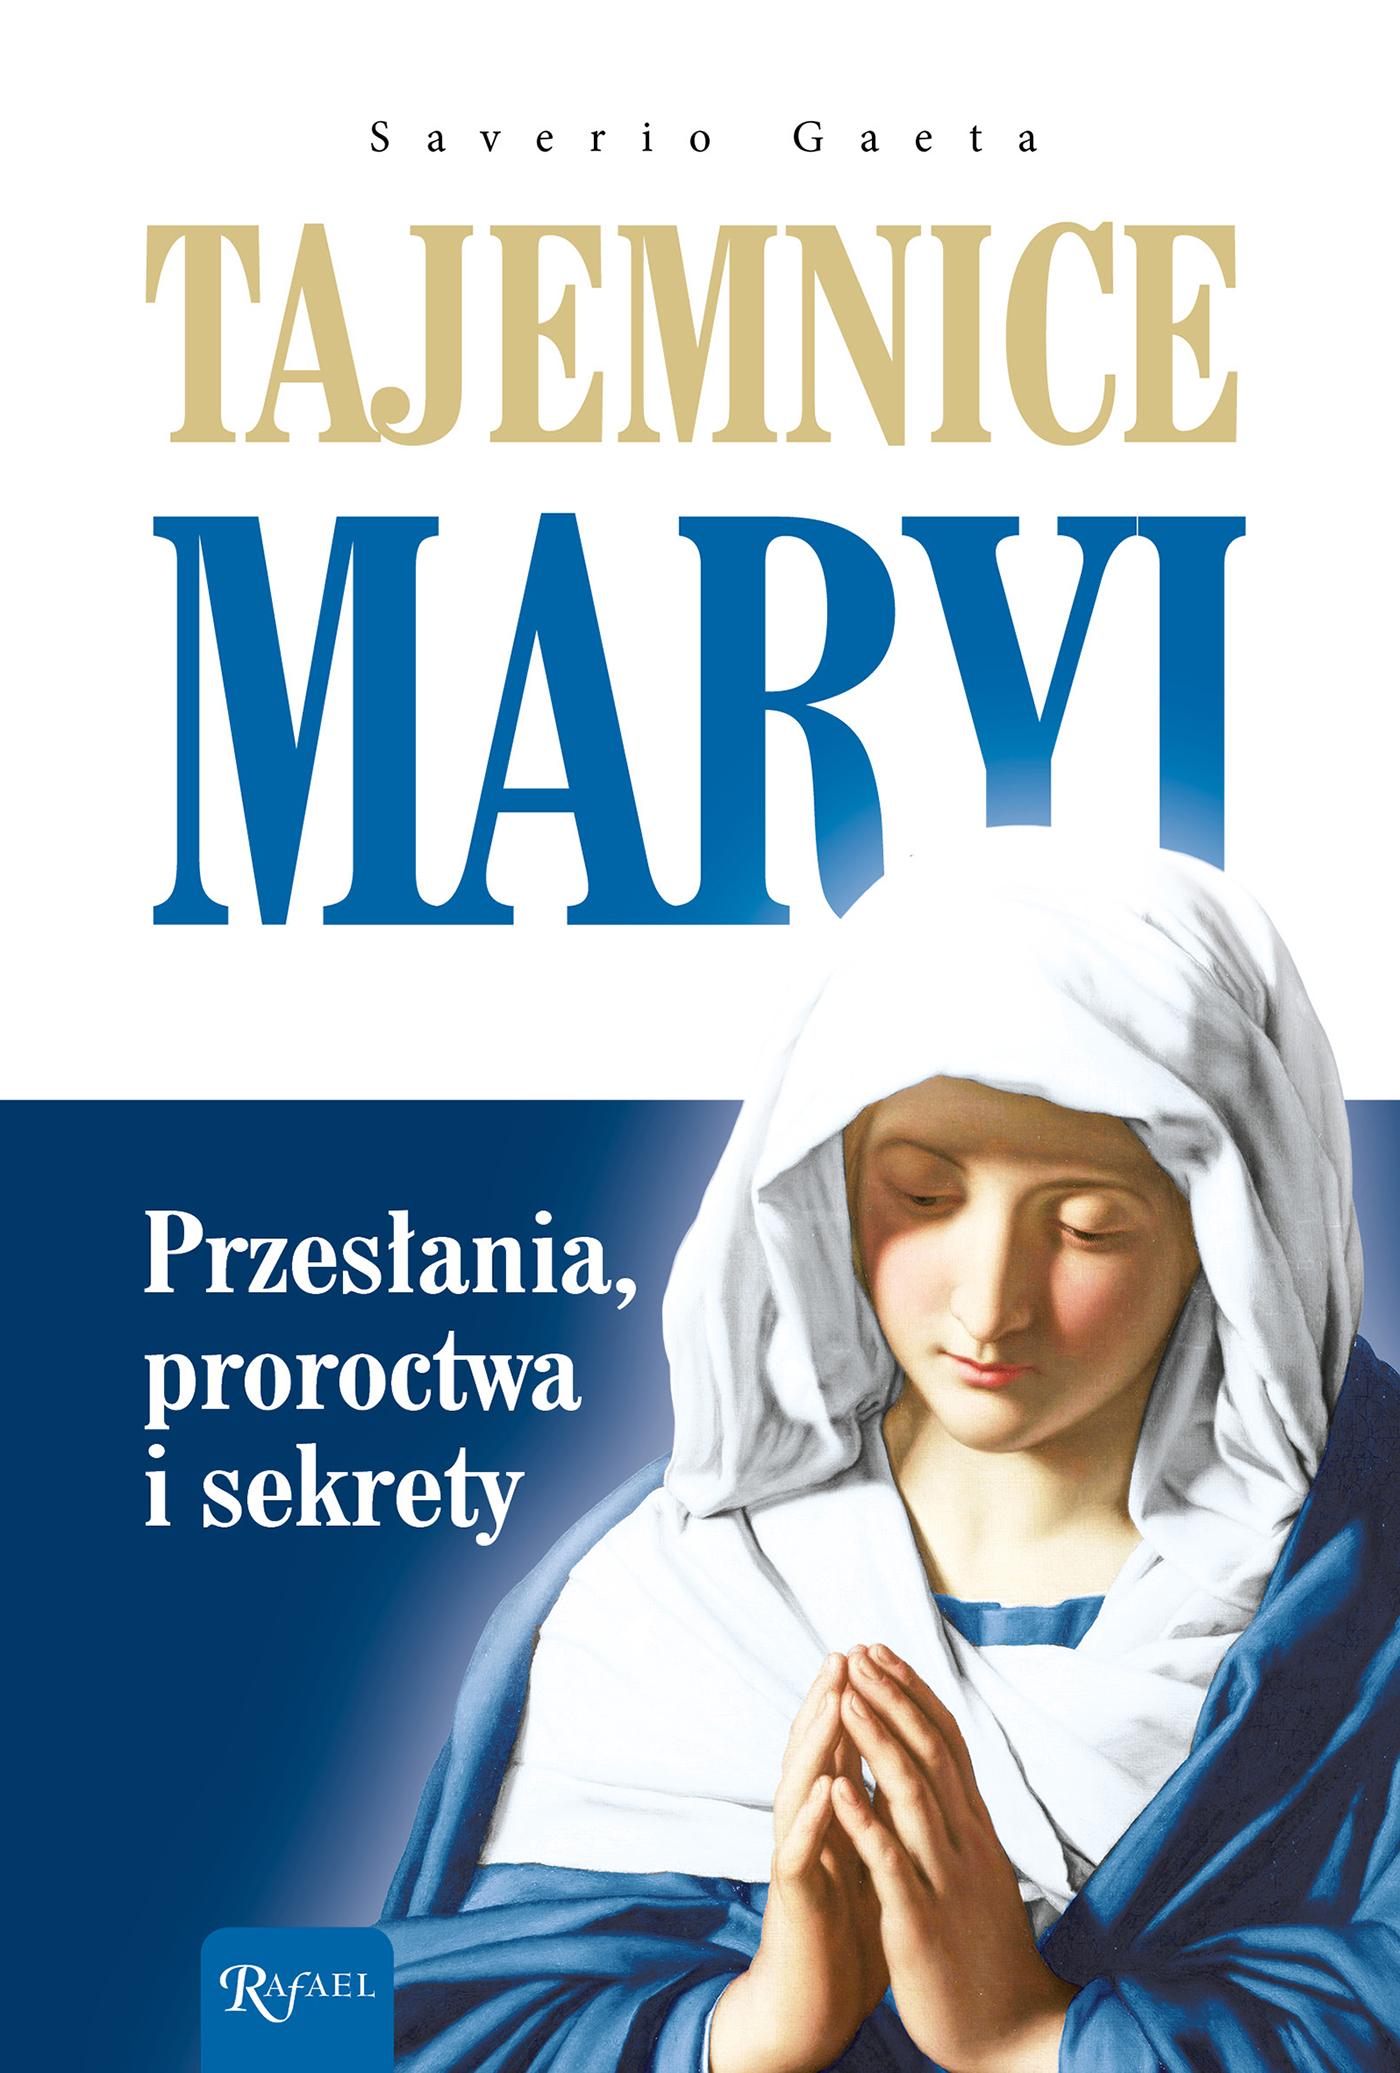 Tajemnice Maryi